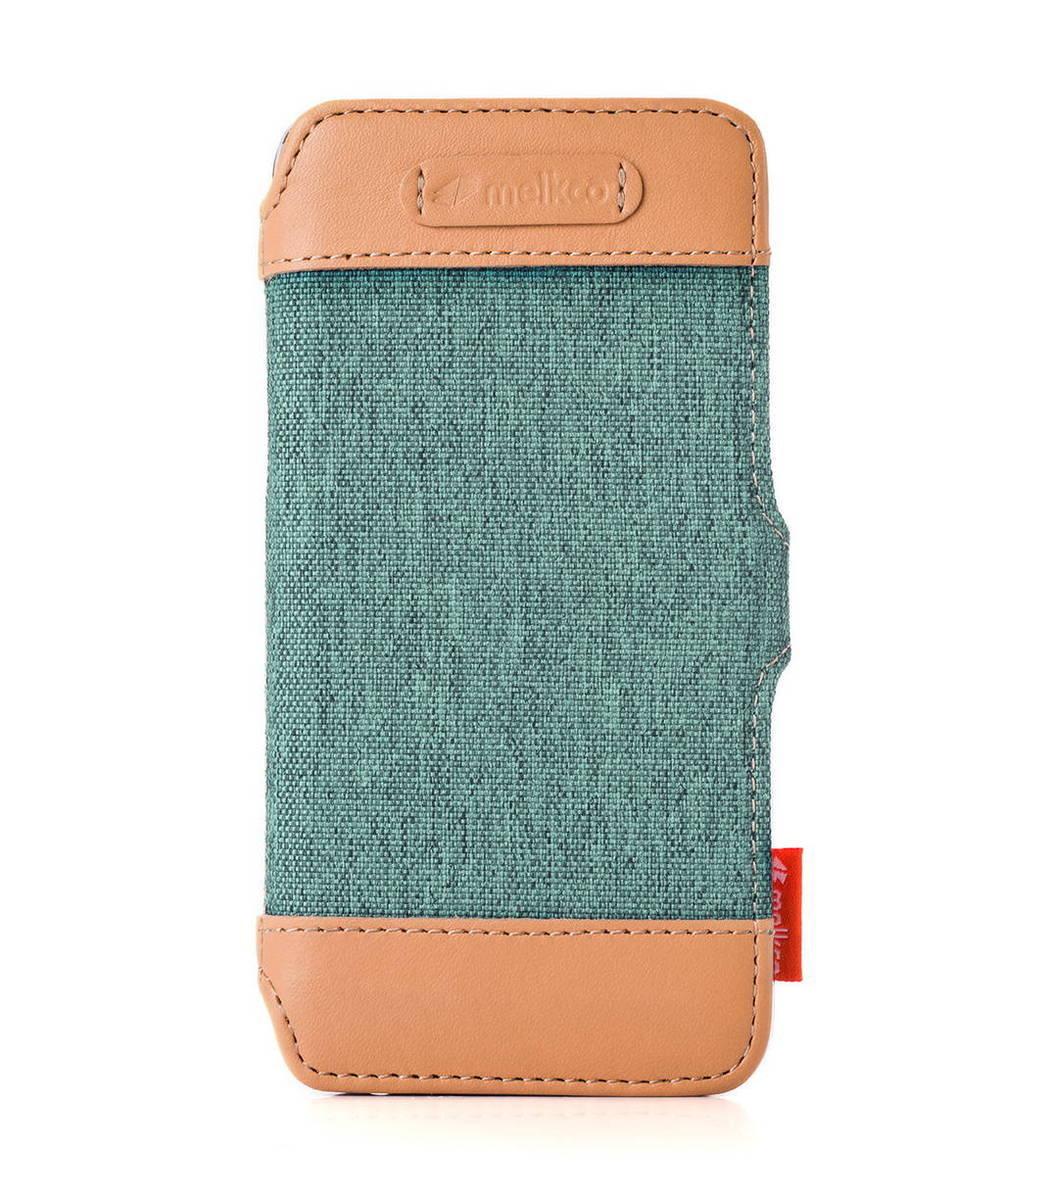 "Apple Iphone 6 Plus/6s Plus (5.5"") Booka Style Cru系列高級時尚真皮手機套(淺青色)"